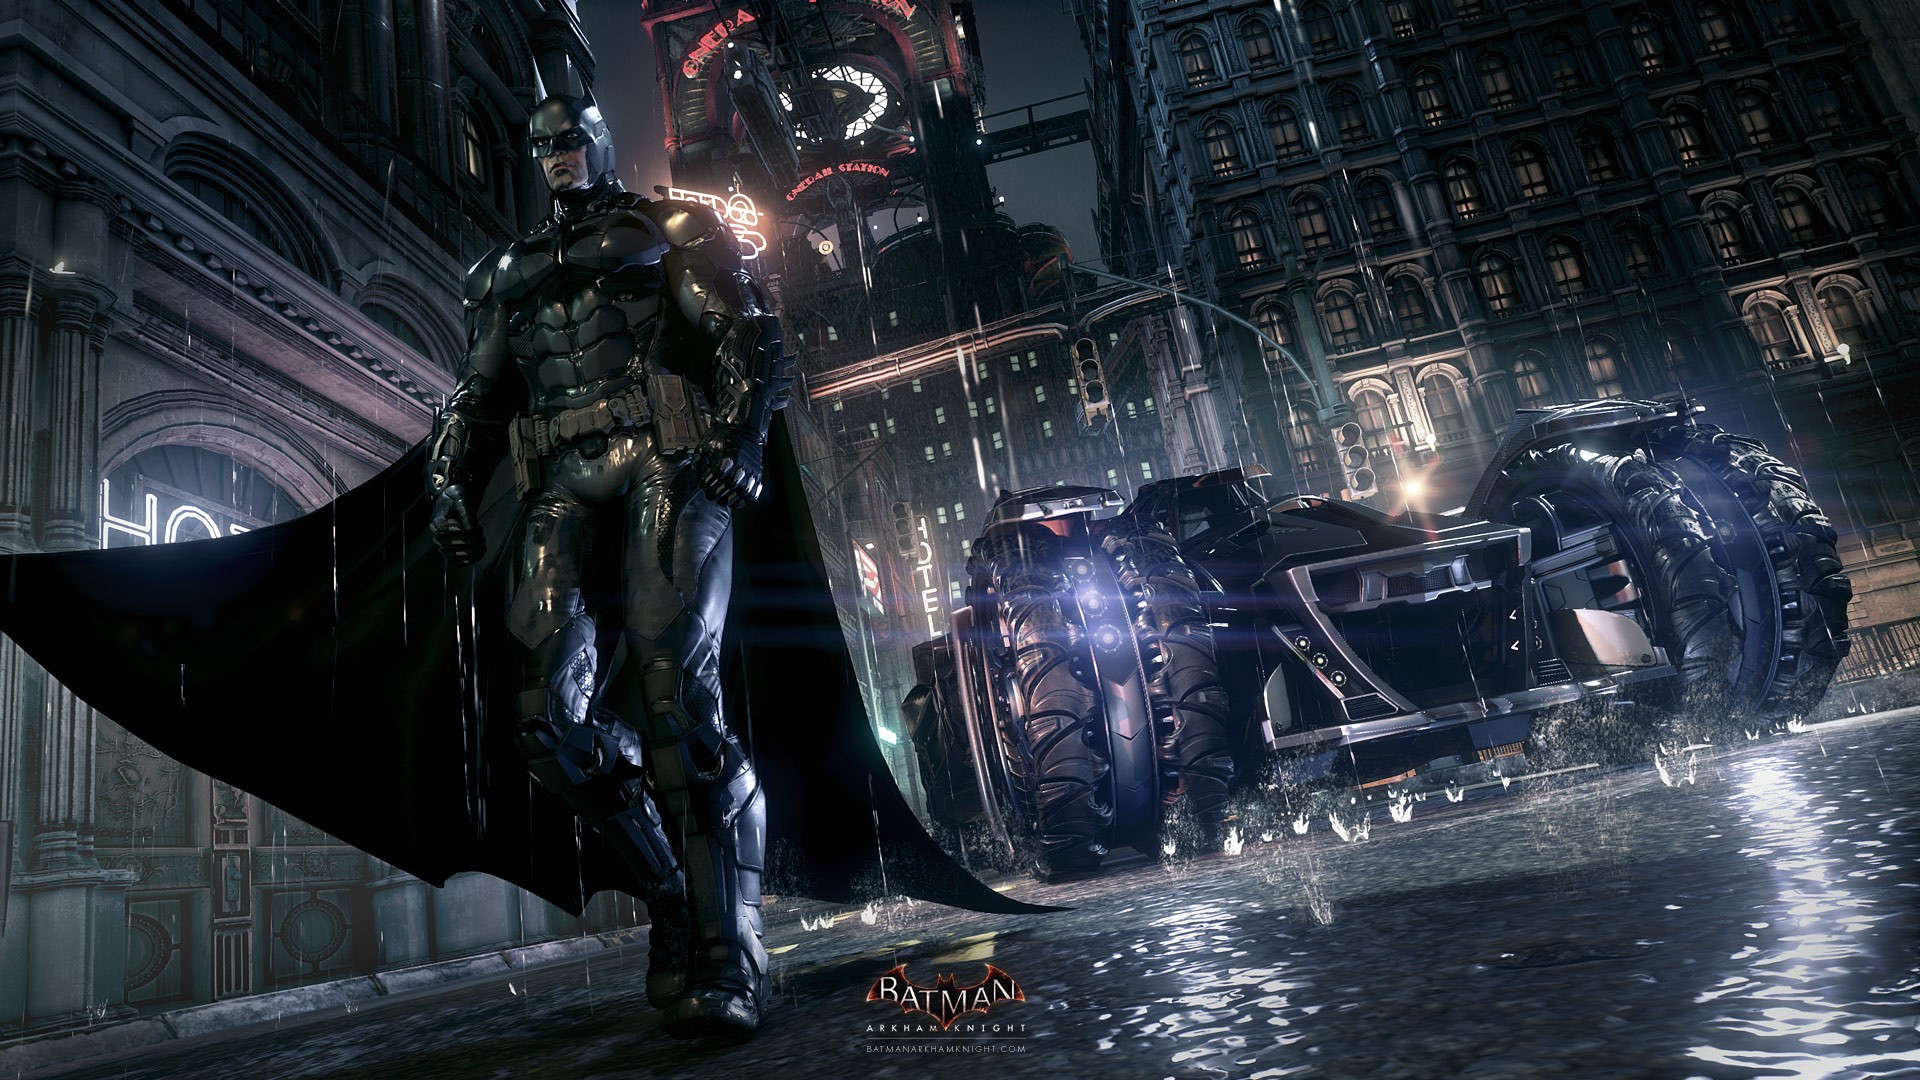 Batman Arkham Knight Wallpaper 18